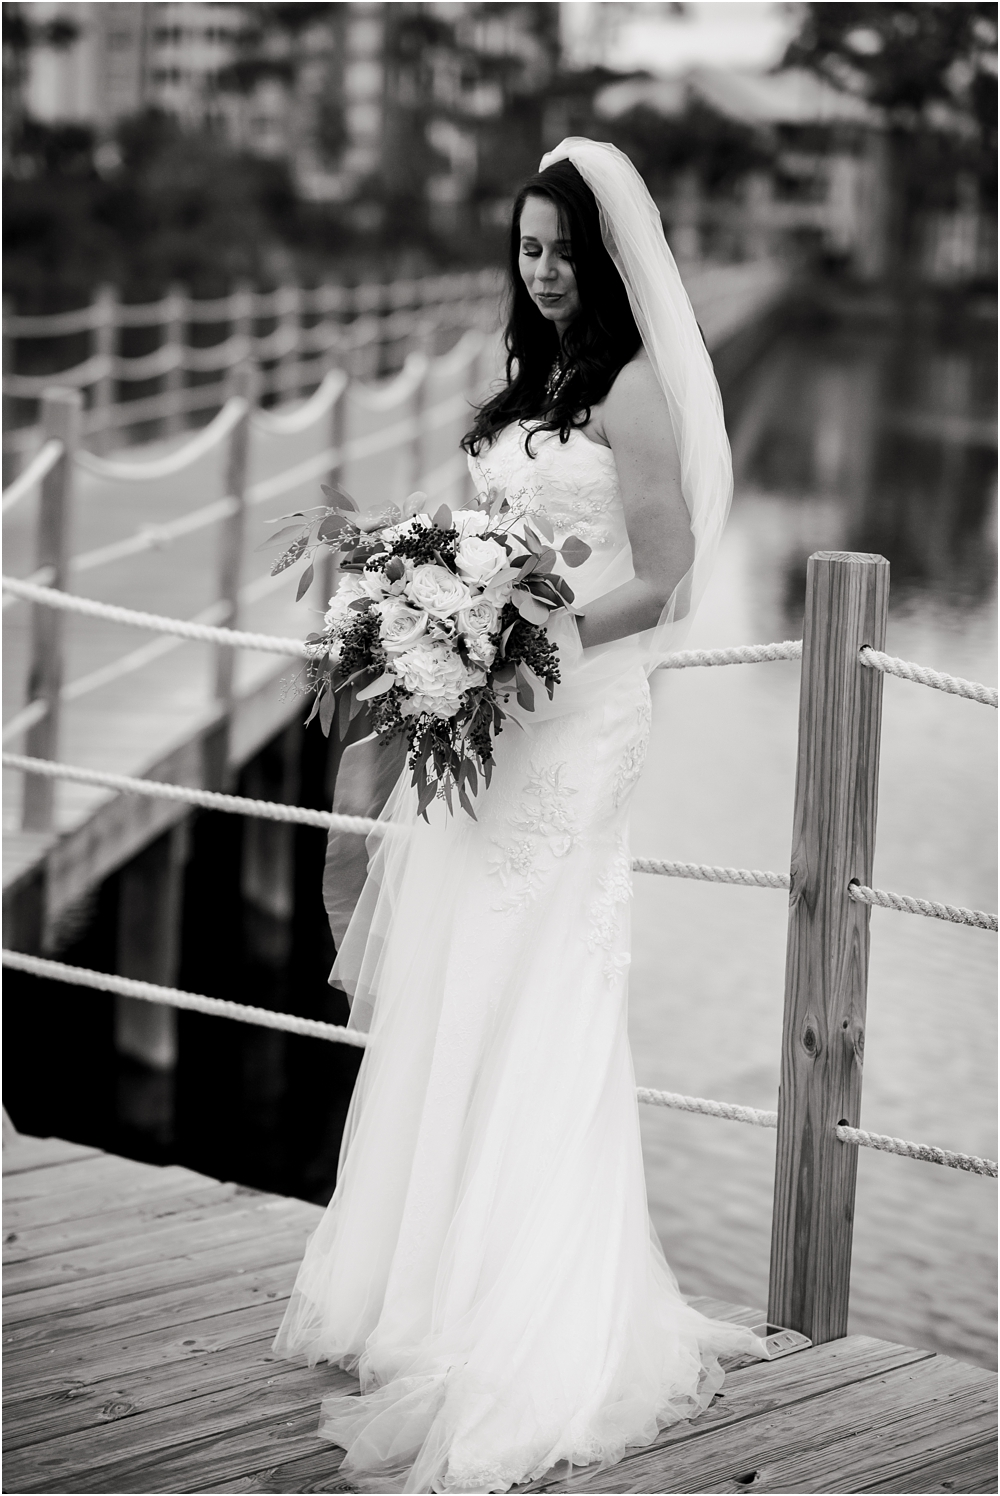 quinn-bay-point-sheraton-florida-wedding-photographer-kiersten-grant-89.jpg